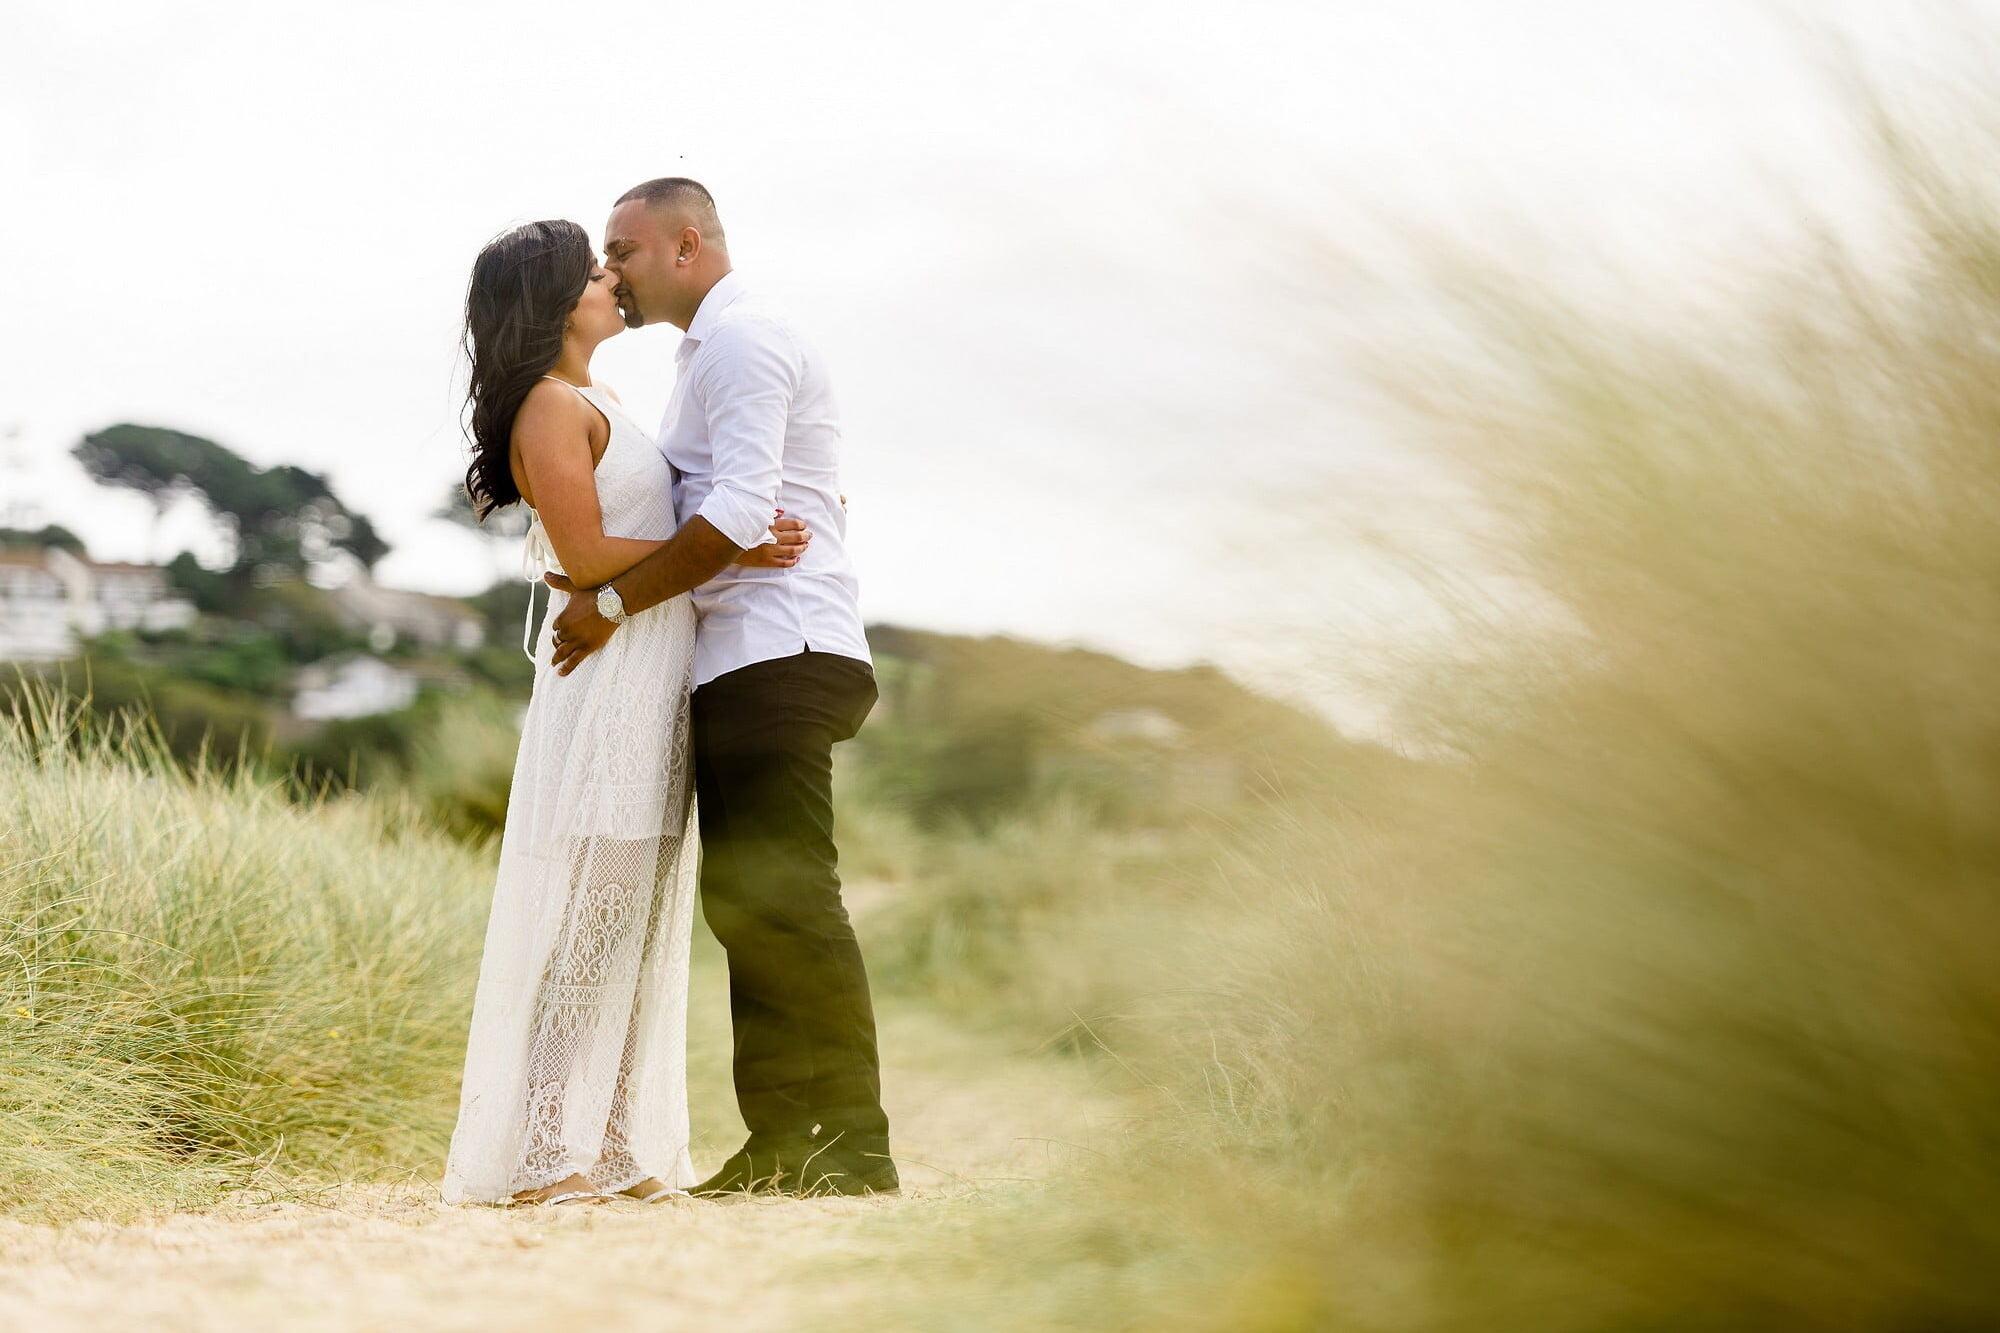 st-michaels-mount-wedding-proposal-5